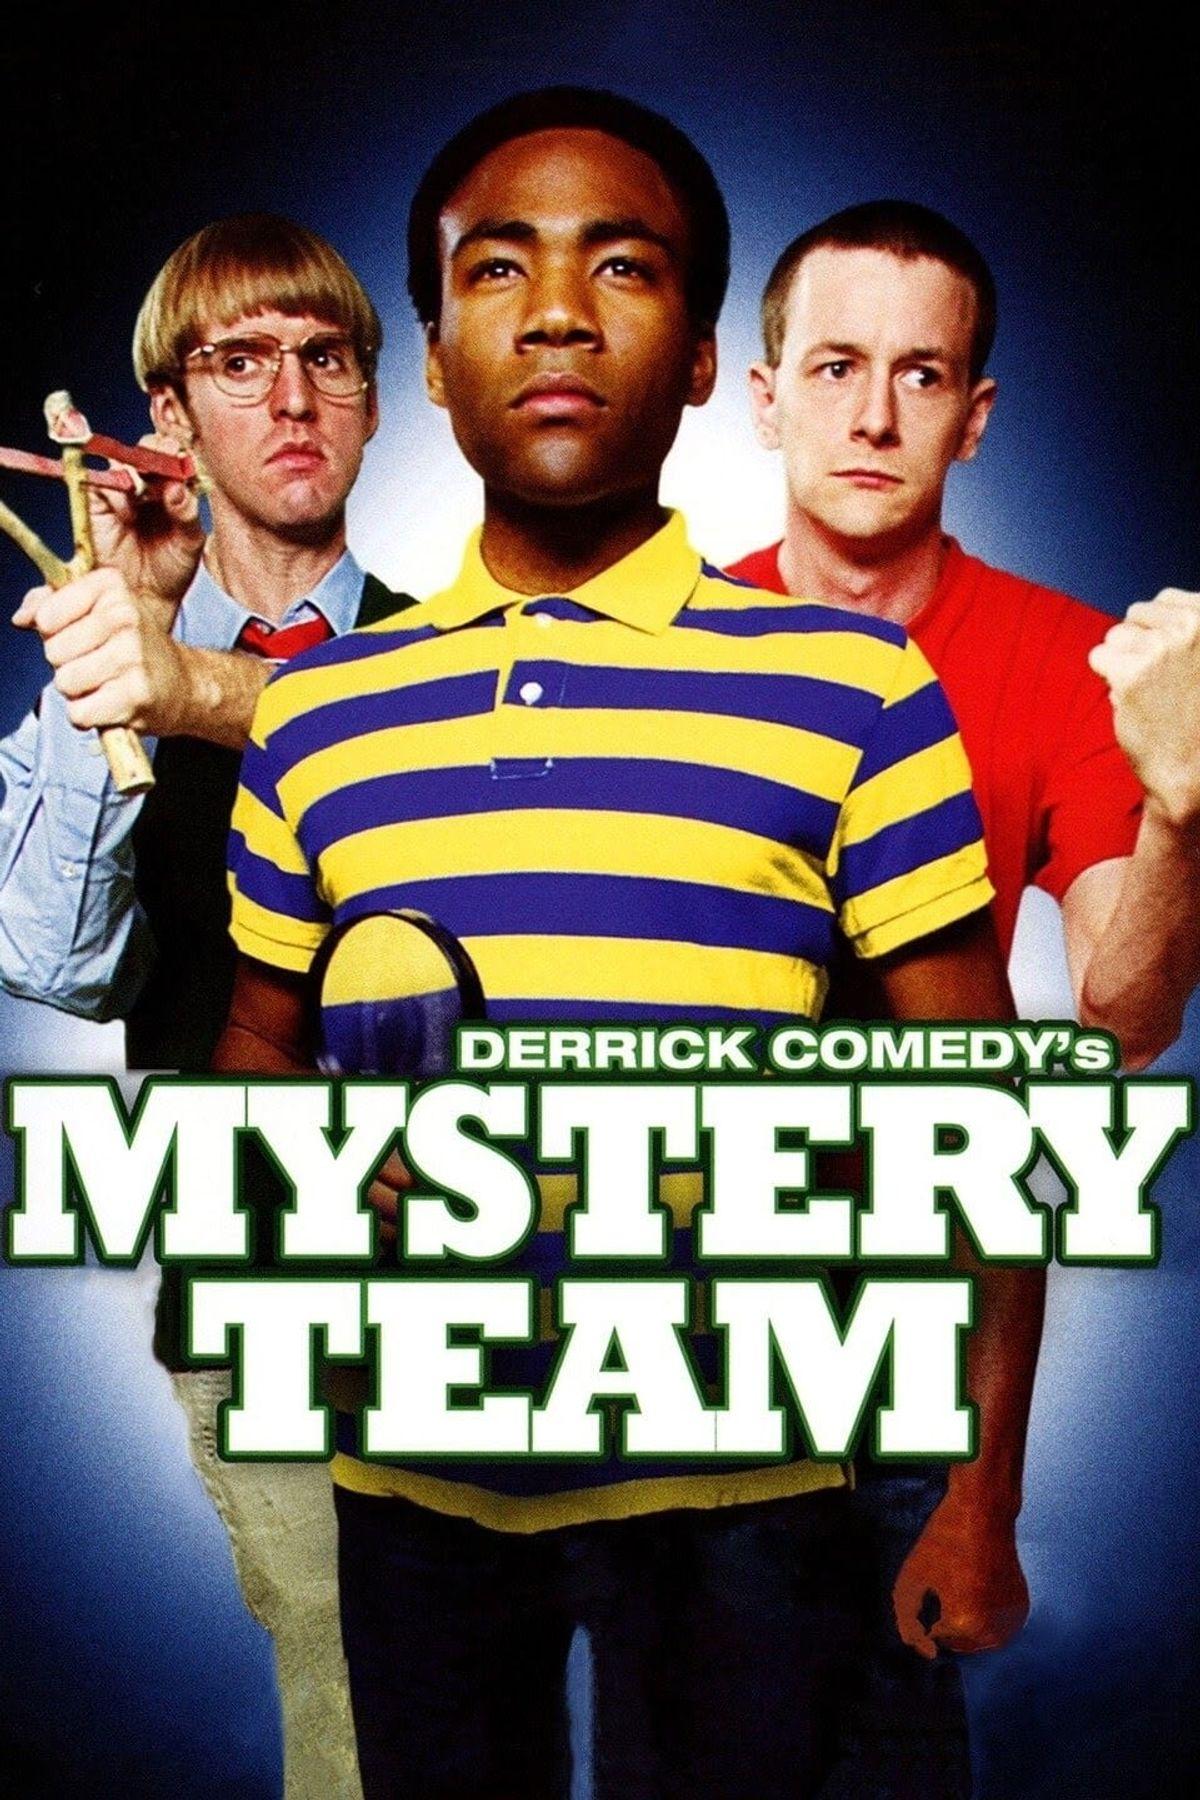 Dan Eckman Best Movies, TV Shows and Web Series List